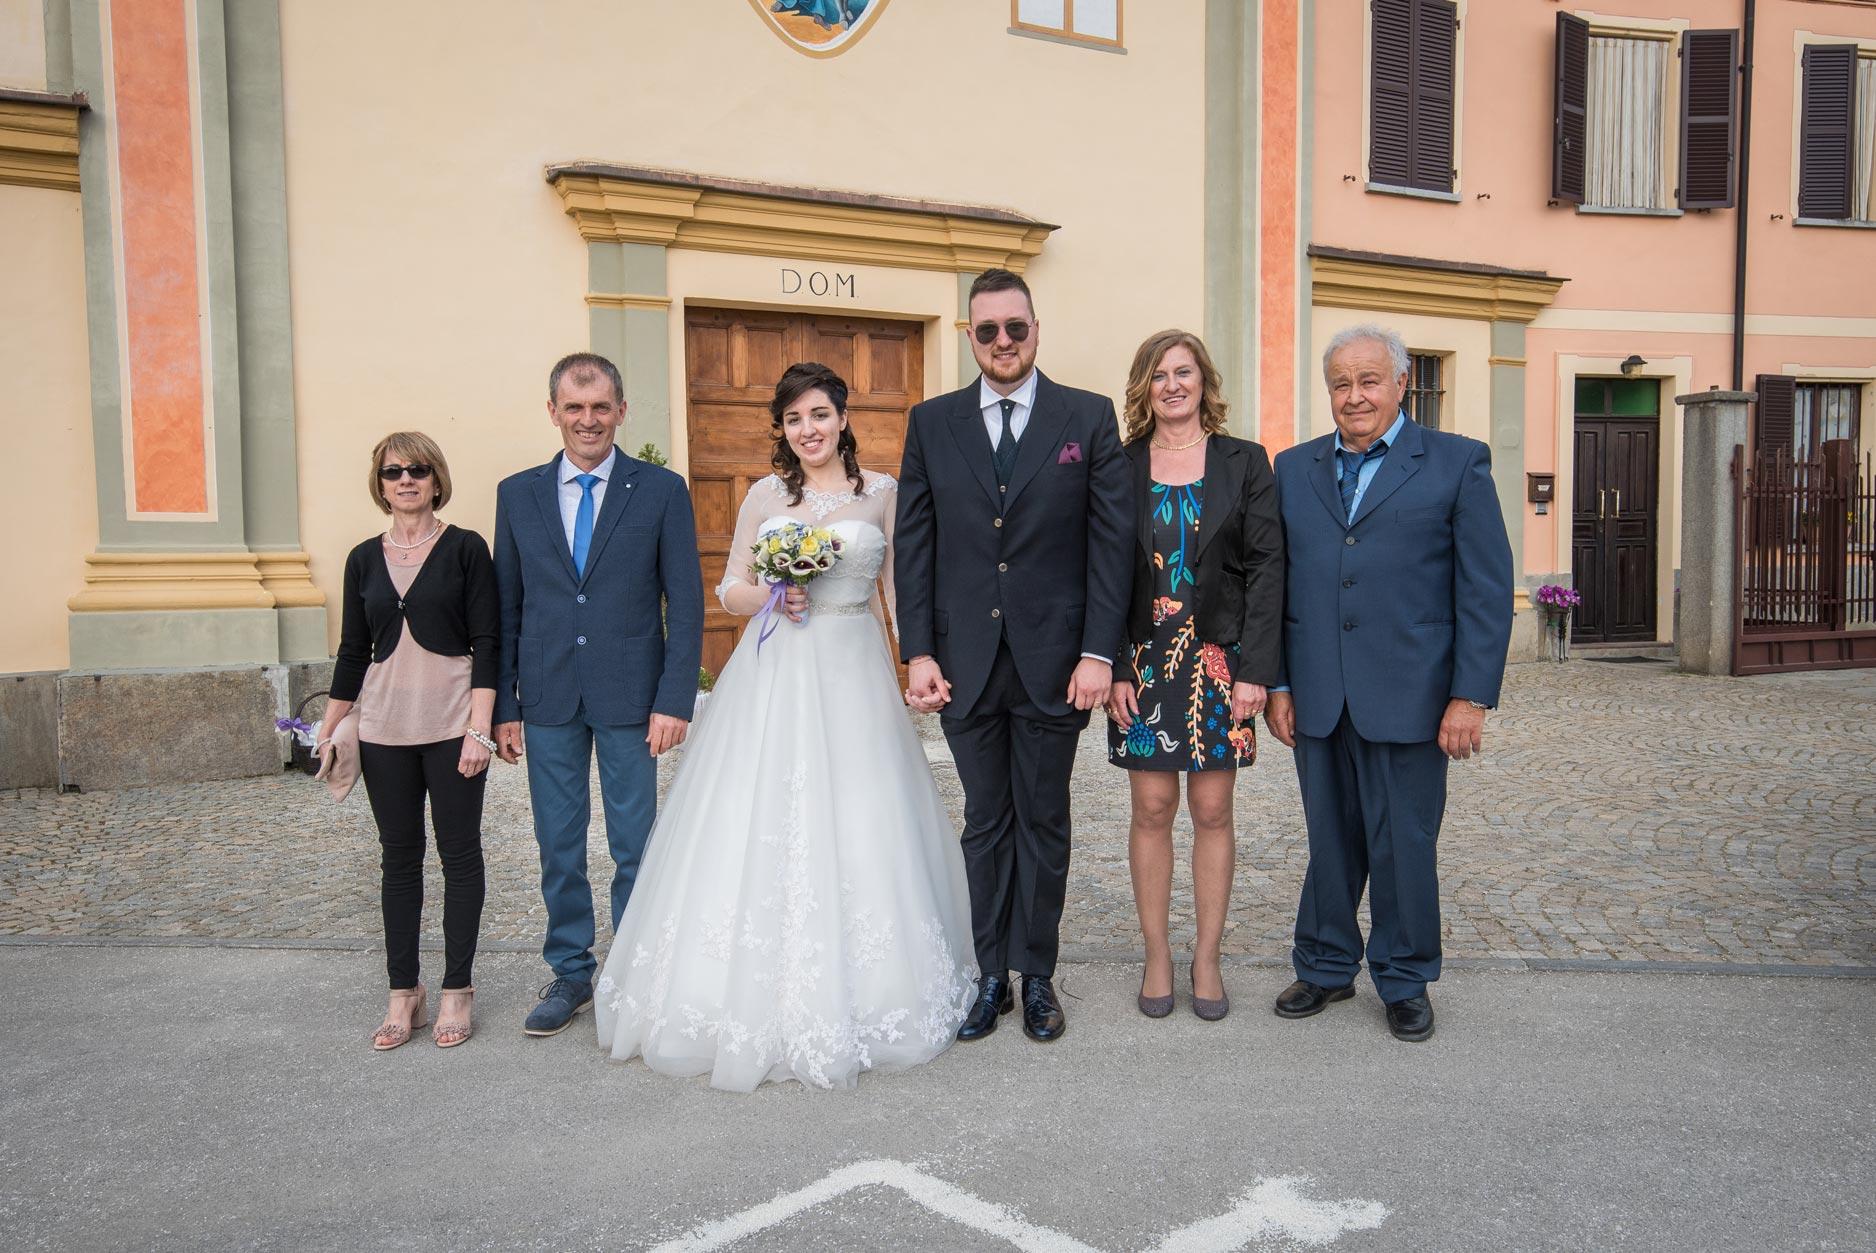 Matrimonio a Narzole Lorenza Diego - DSC 0647 - Fotografie matrimonio con parenti - Fotografie matrimonio con parenti